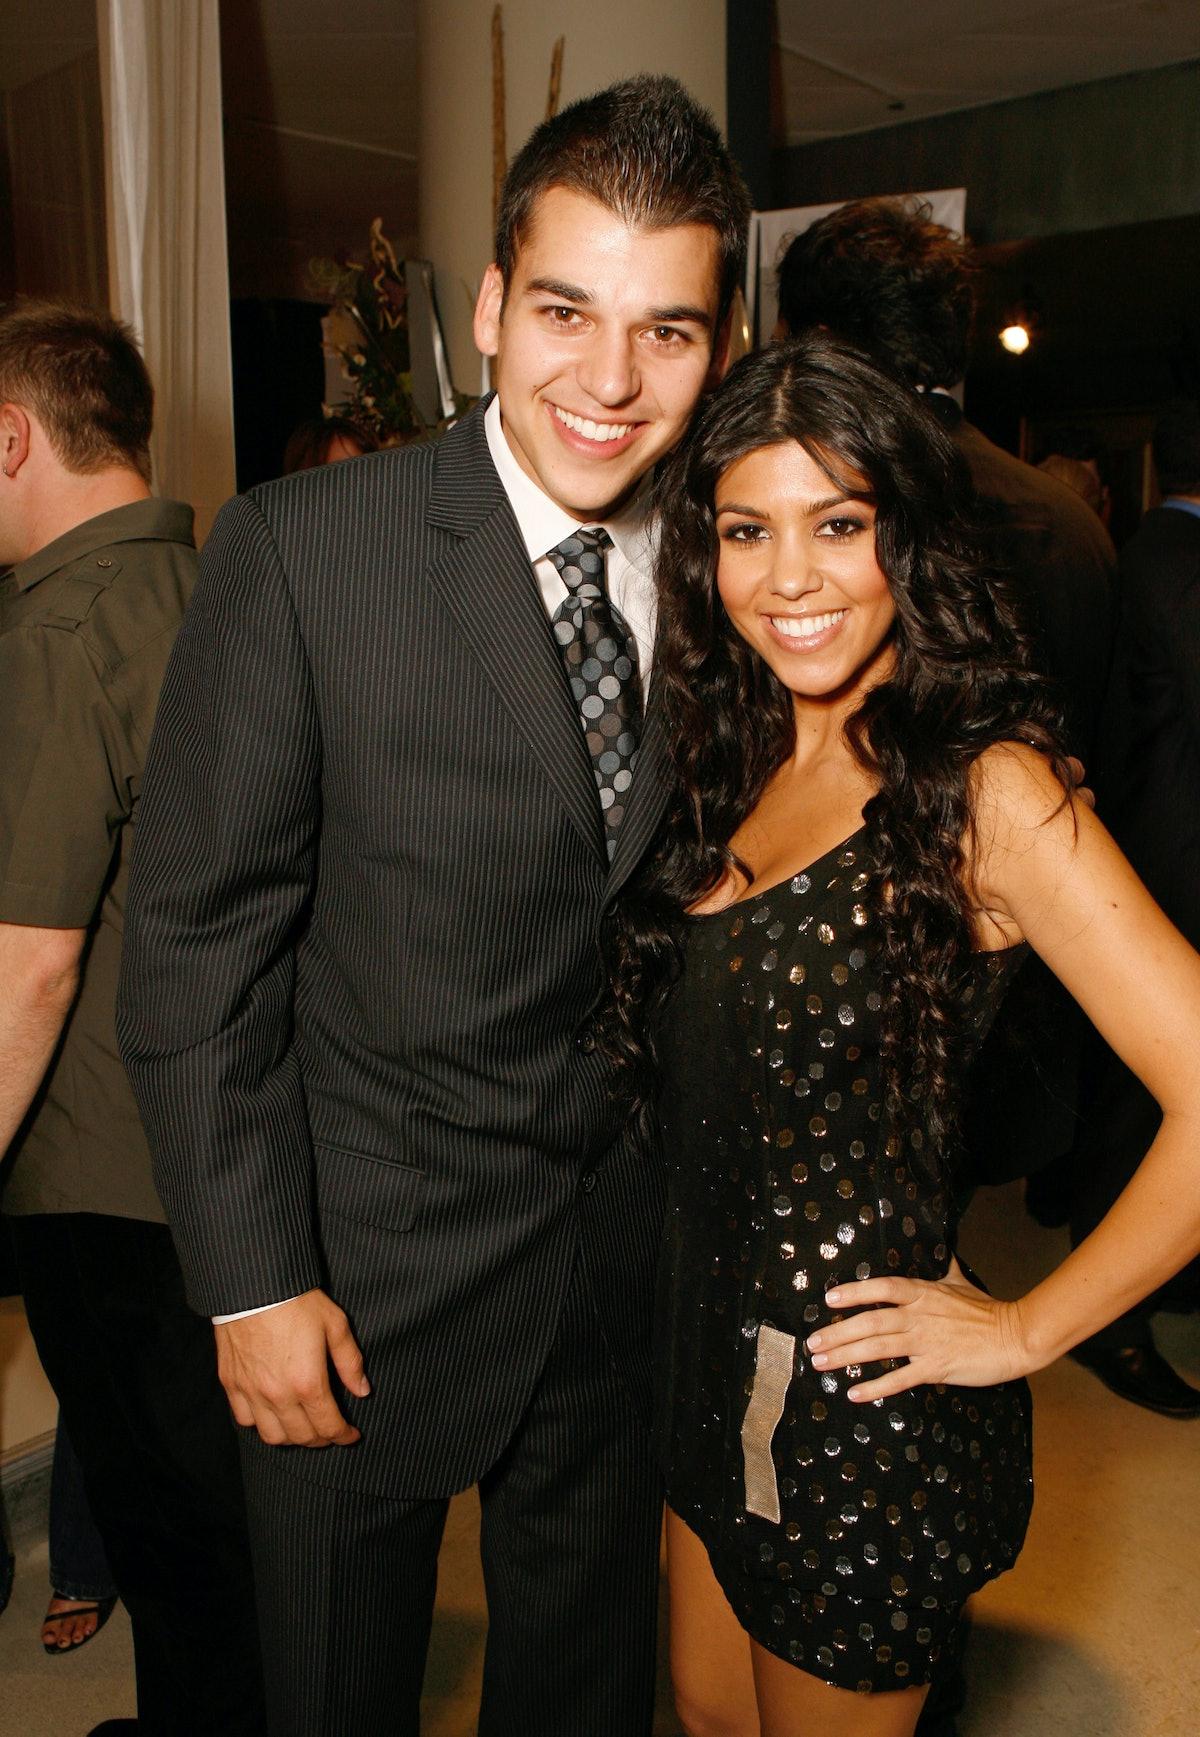 Rob Kardashian and Kourtney Kardashian pose for a photo.